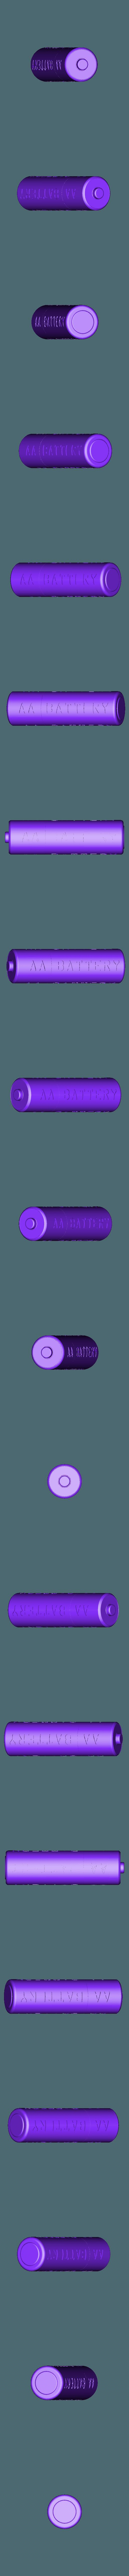 Digital AA Battery-MM.stl Download free STL file AA Battery Reference Model • 3D print design, johnbearross